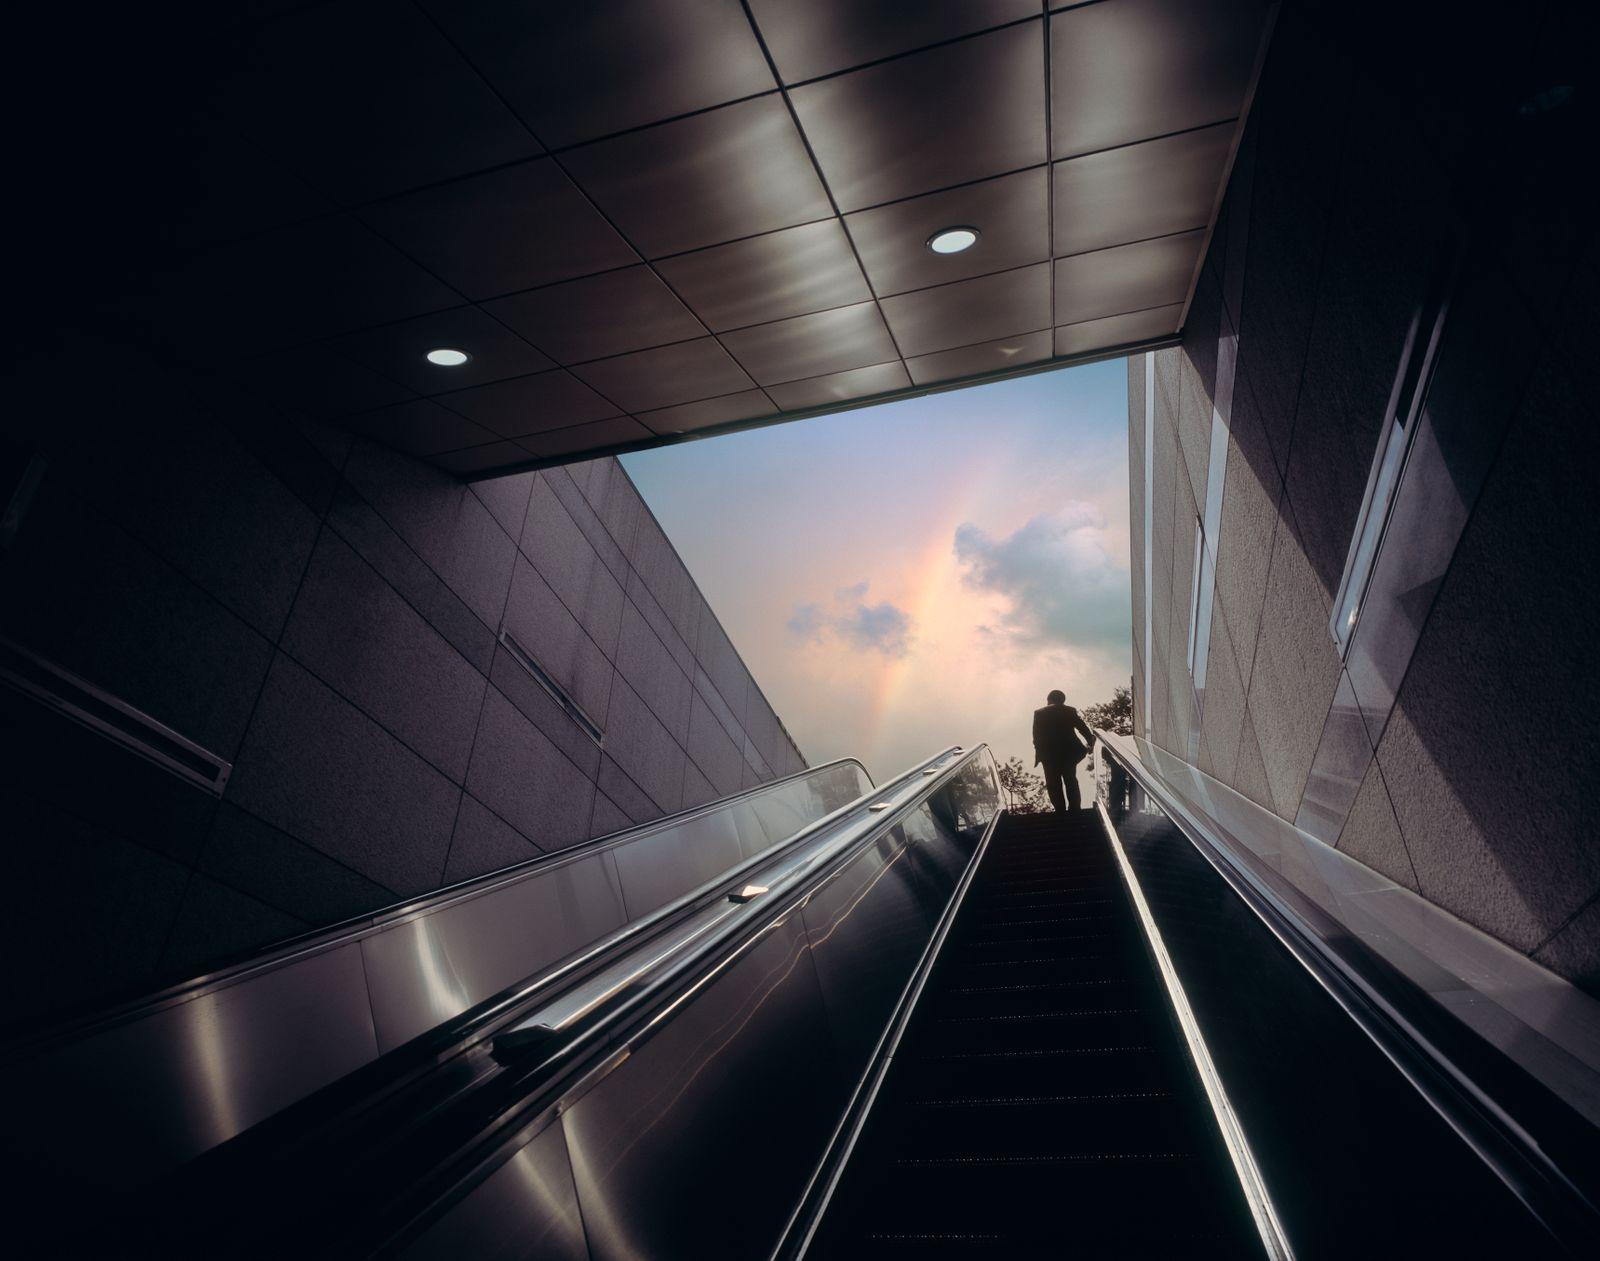 Businessman on escalator moving towards sky with rainbow